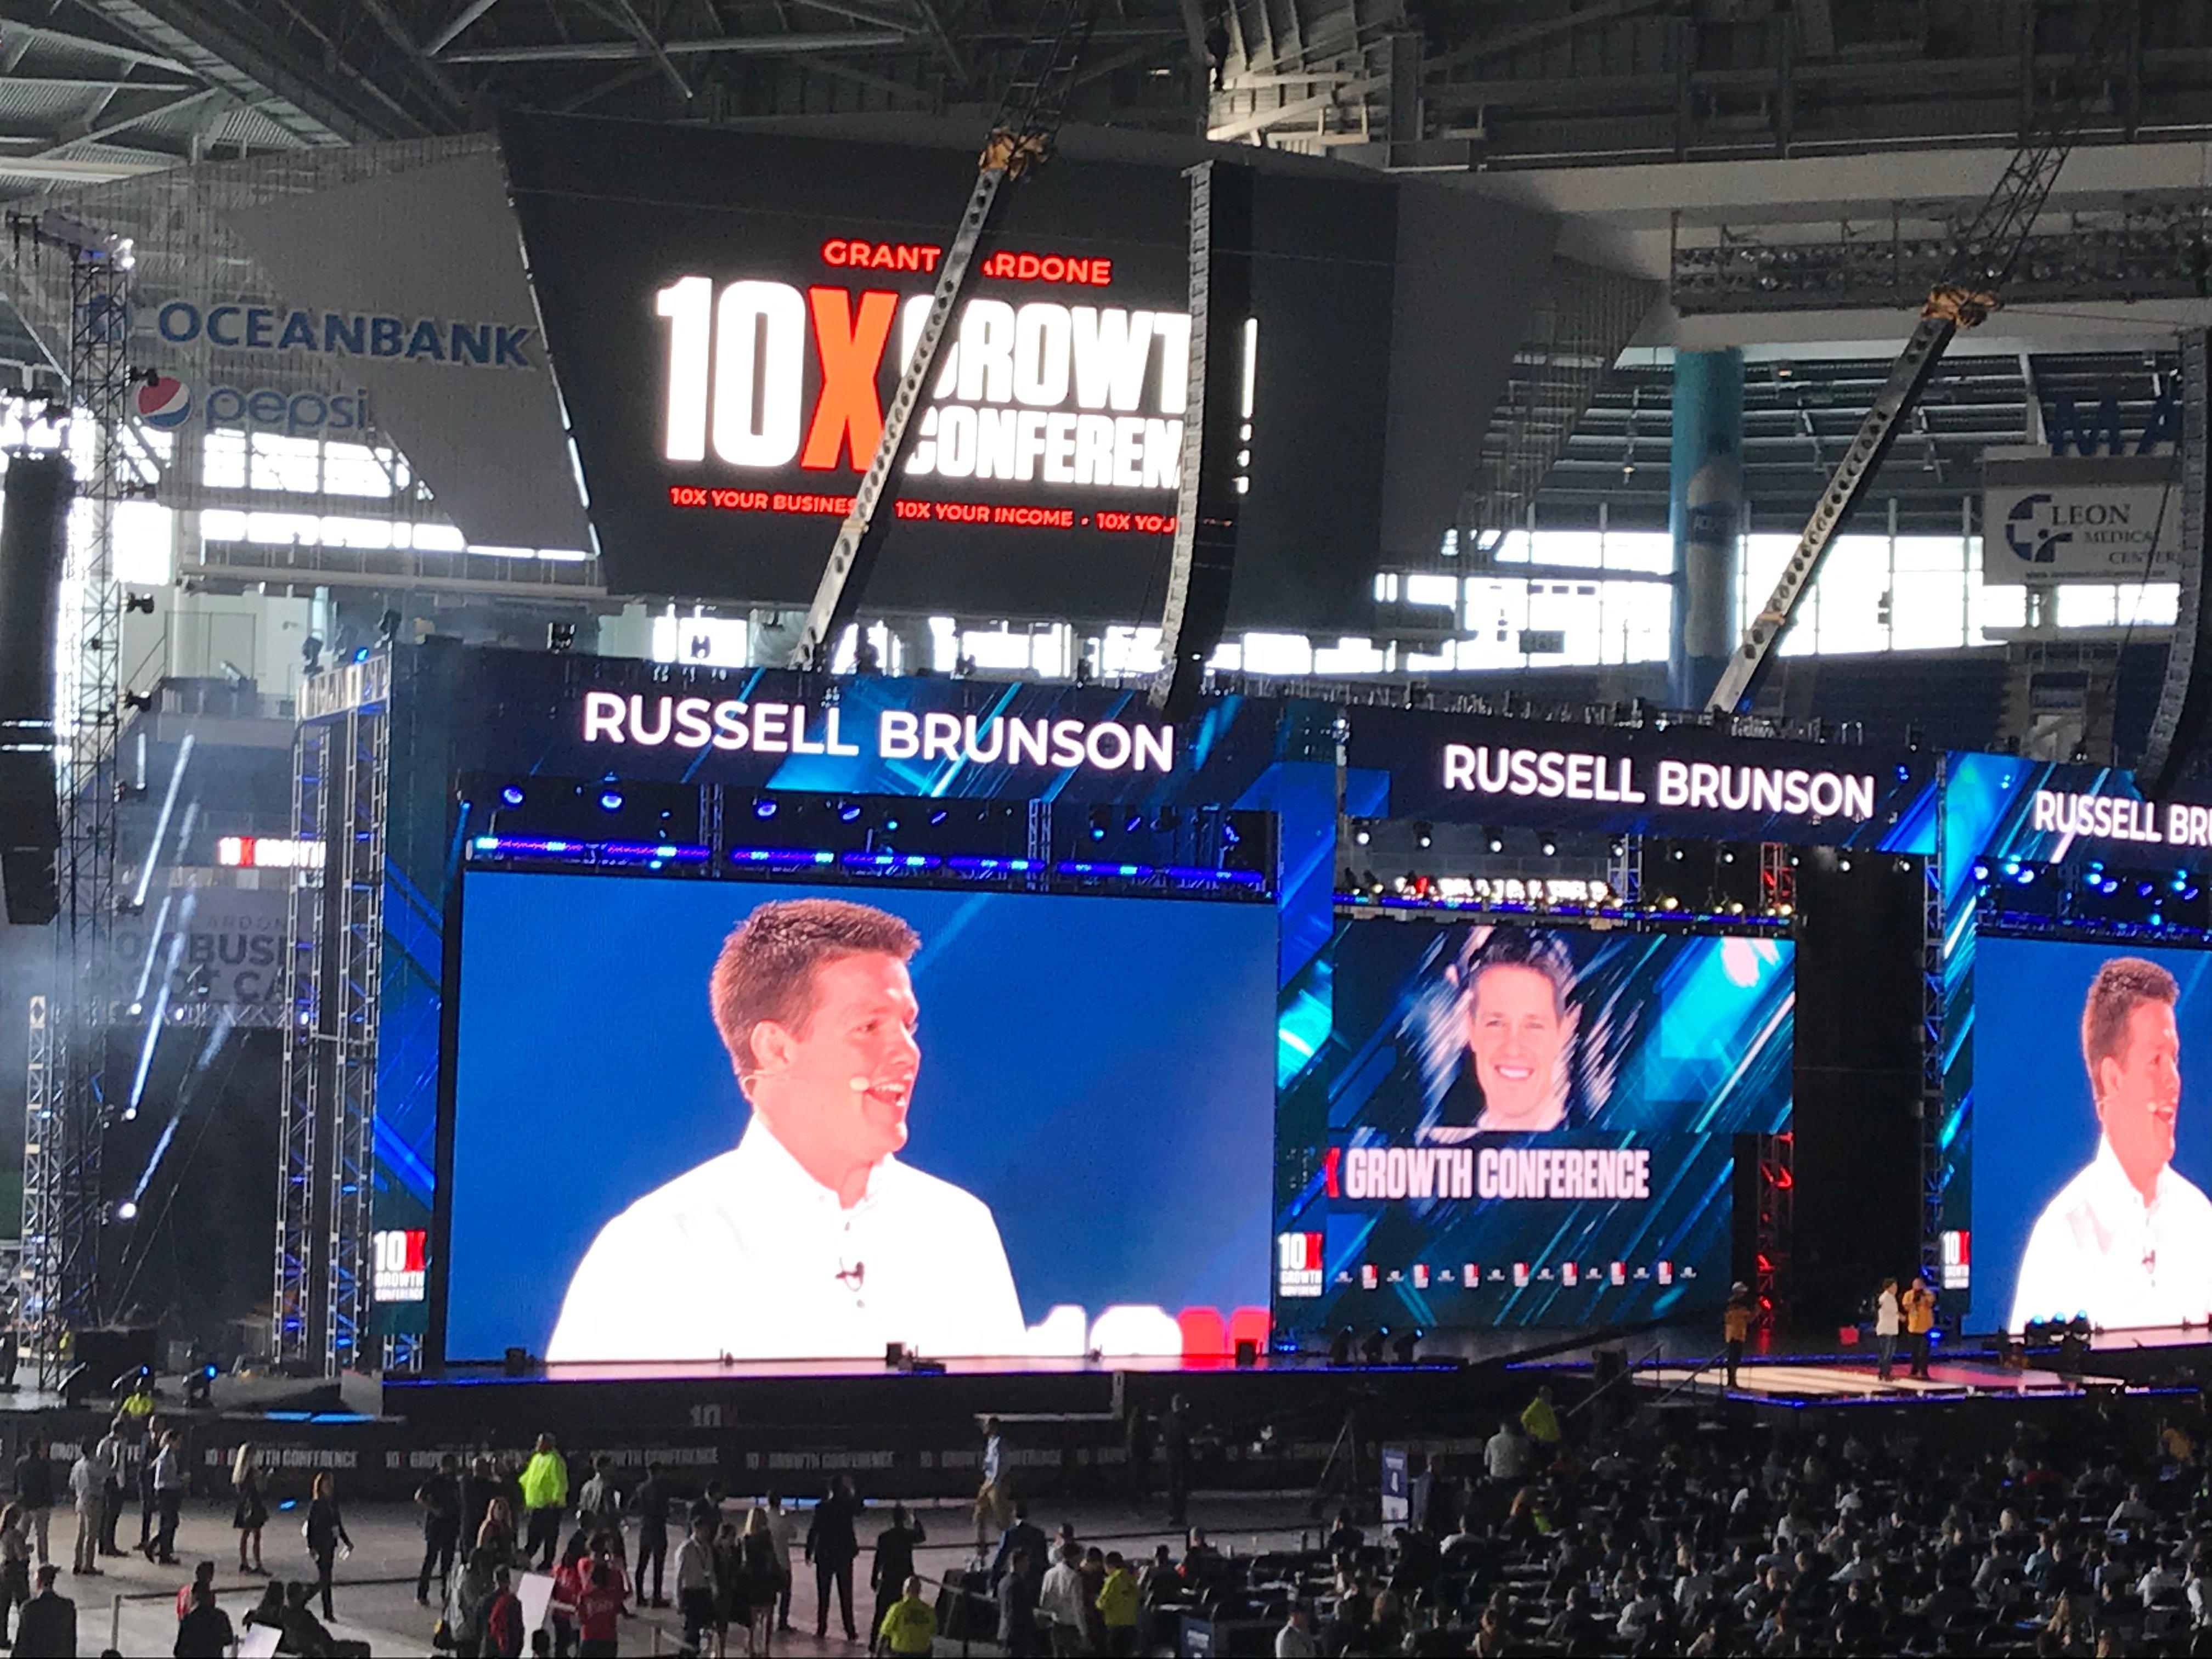 russel-brunson-onstage-at-10x-con-1